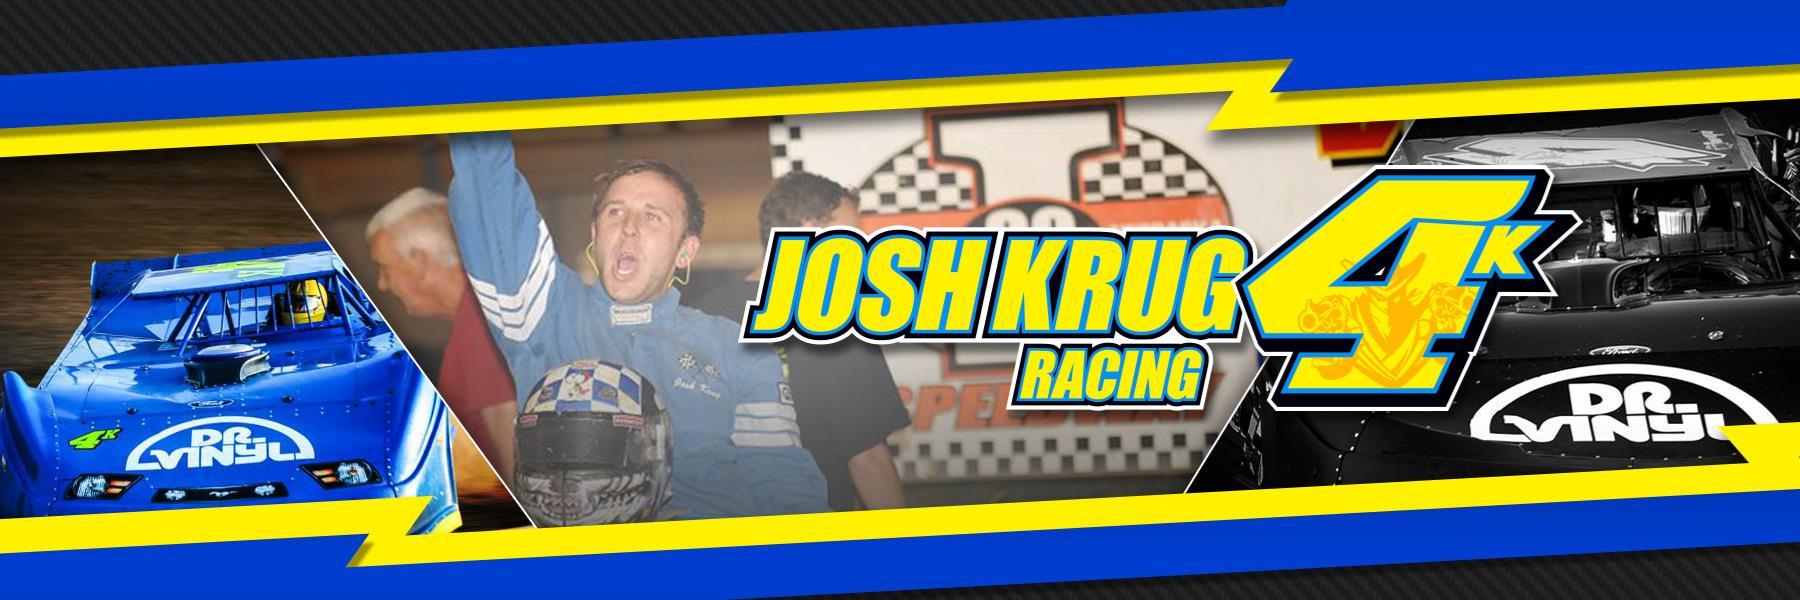 Josh Krug